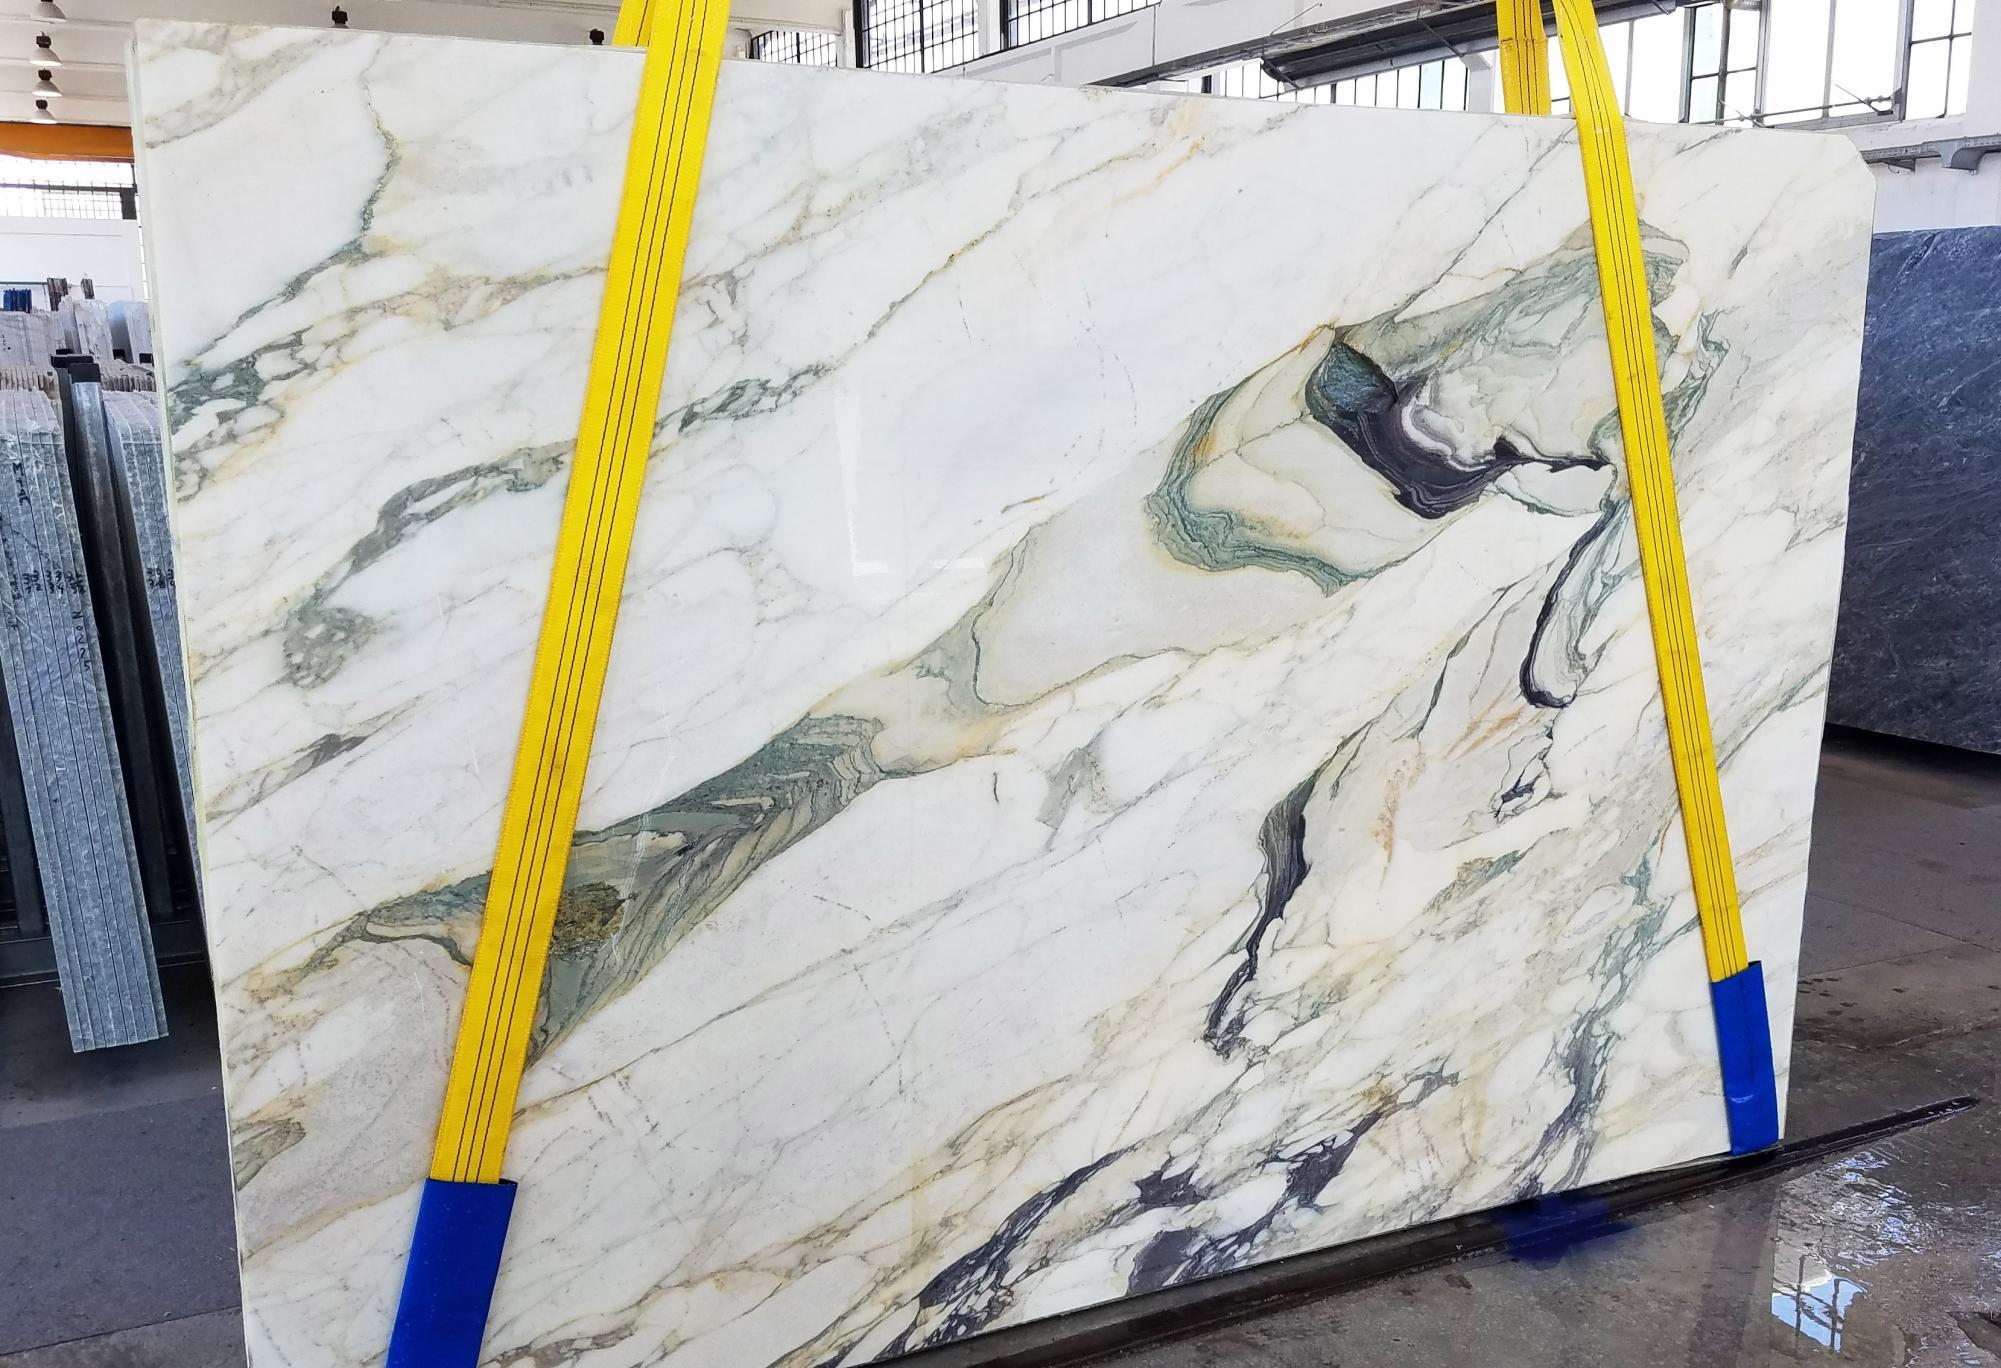 CALACATTA FIORITO Supply Veneto (Italy) sawn slabs U0433 , Slab #25 natural marble